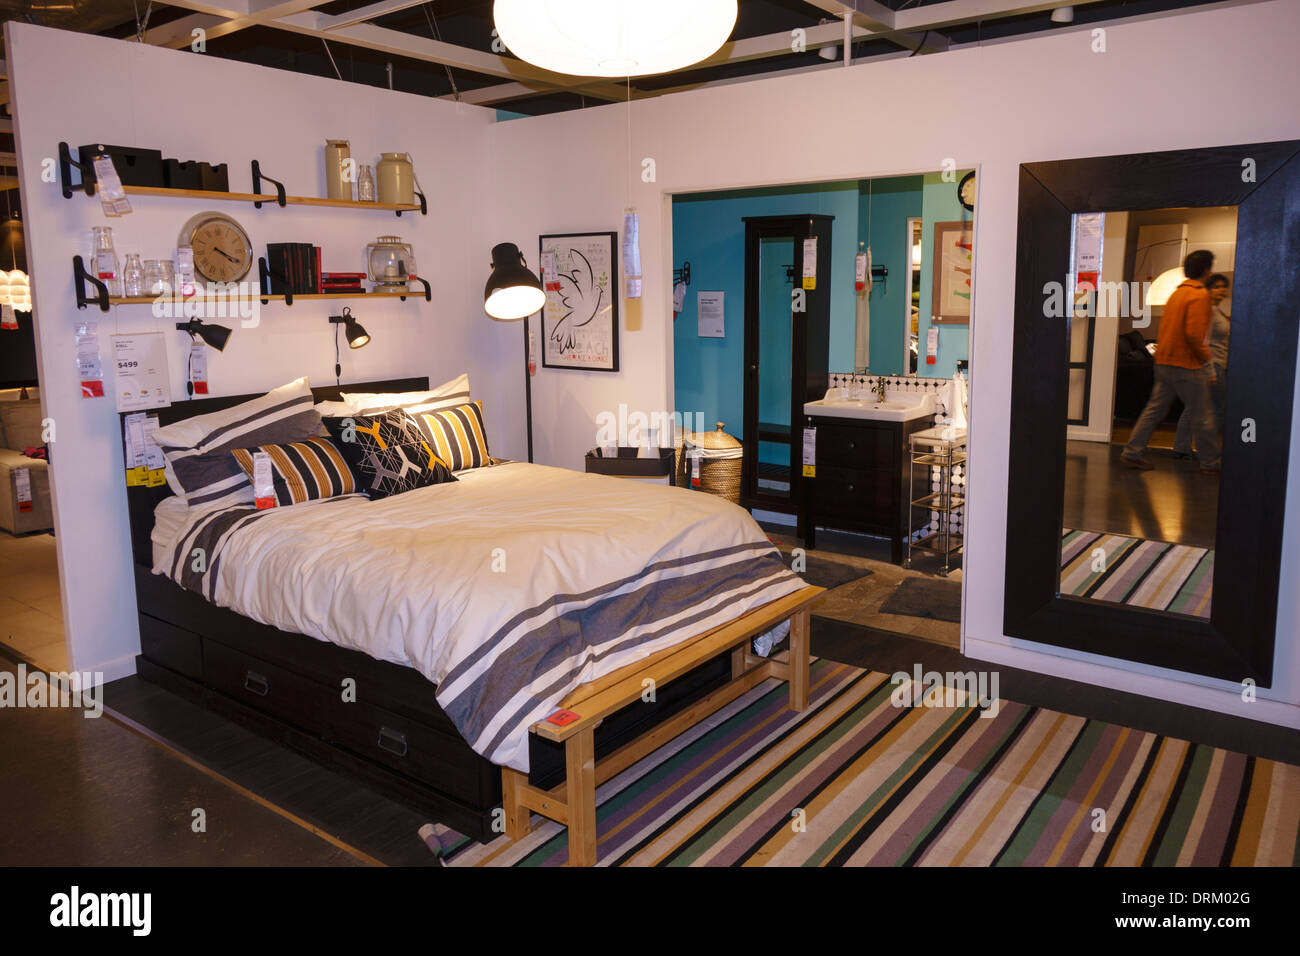 Fort Lauderdale Ft. Florida Sunrise IKEA home furnishings furniture ...